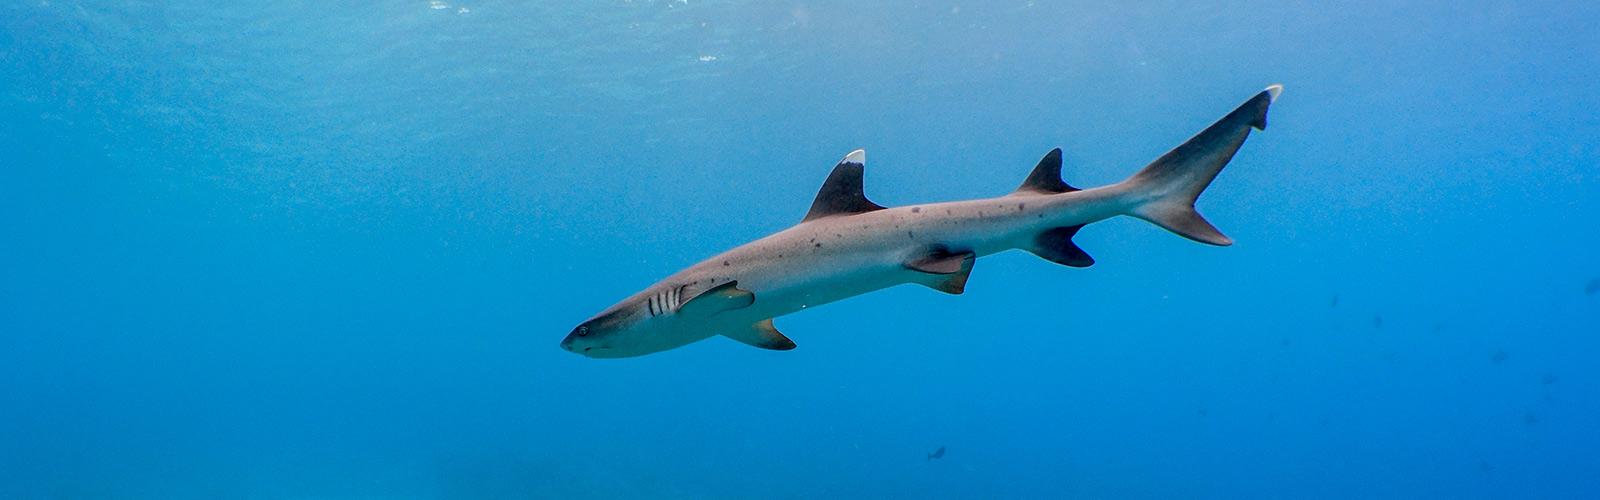 Maldives shark diving